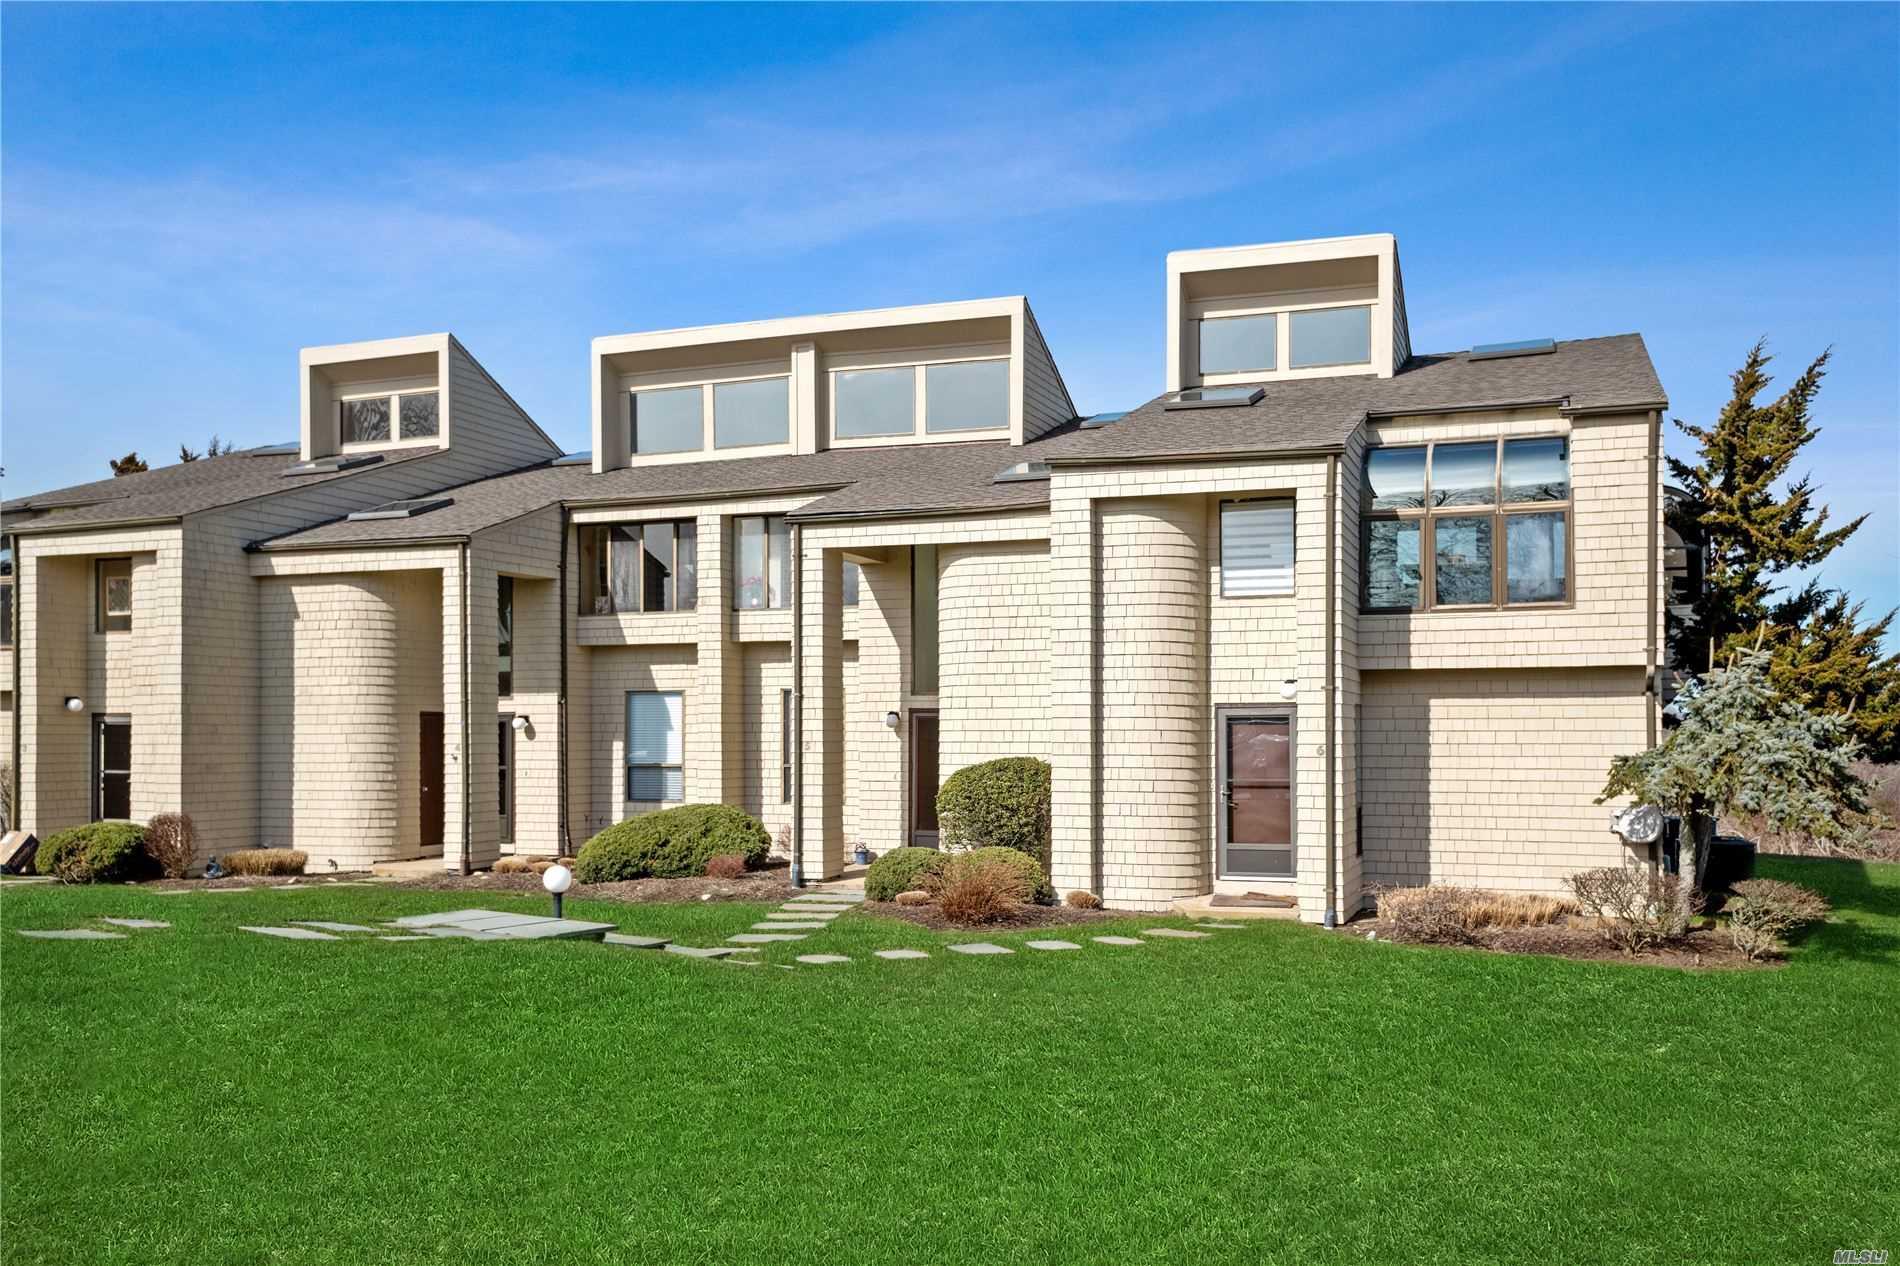 Property for sale at 21 S Fulton Street # 4, Montauk NY 11954, Montauk,  New York 11954